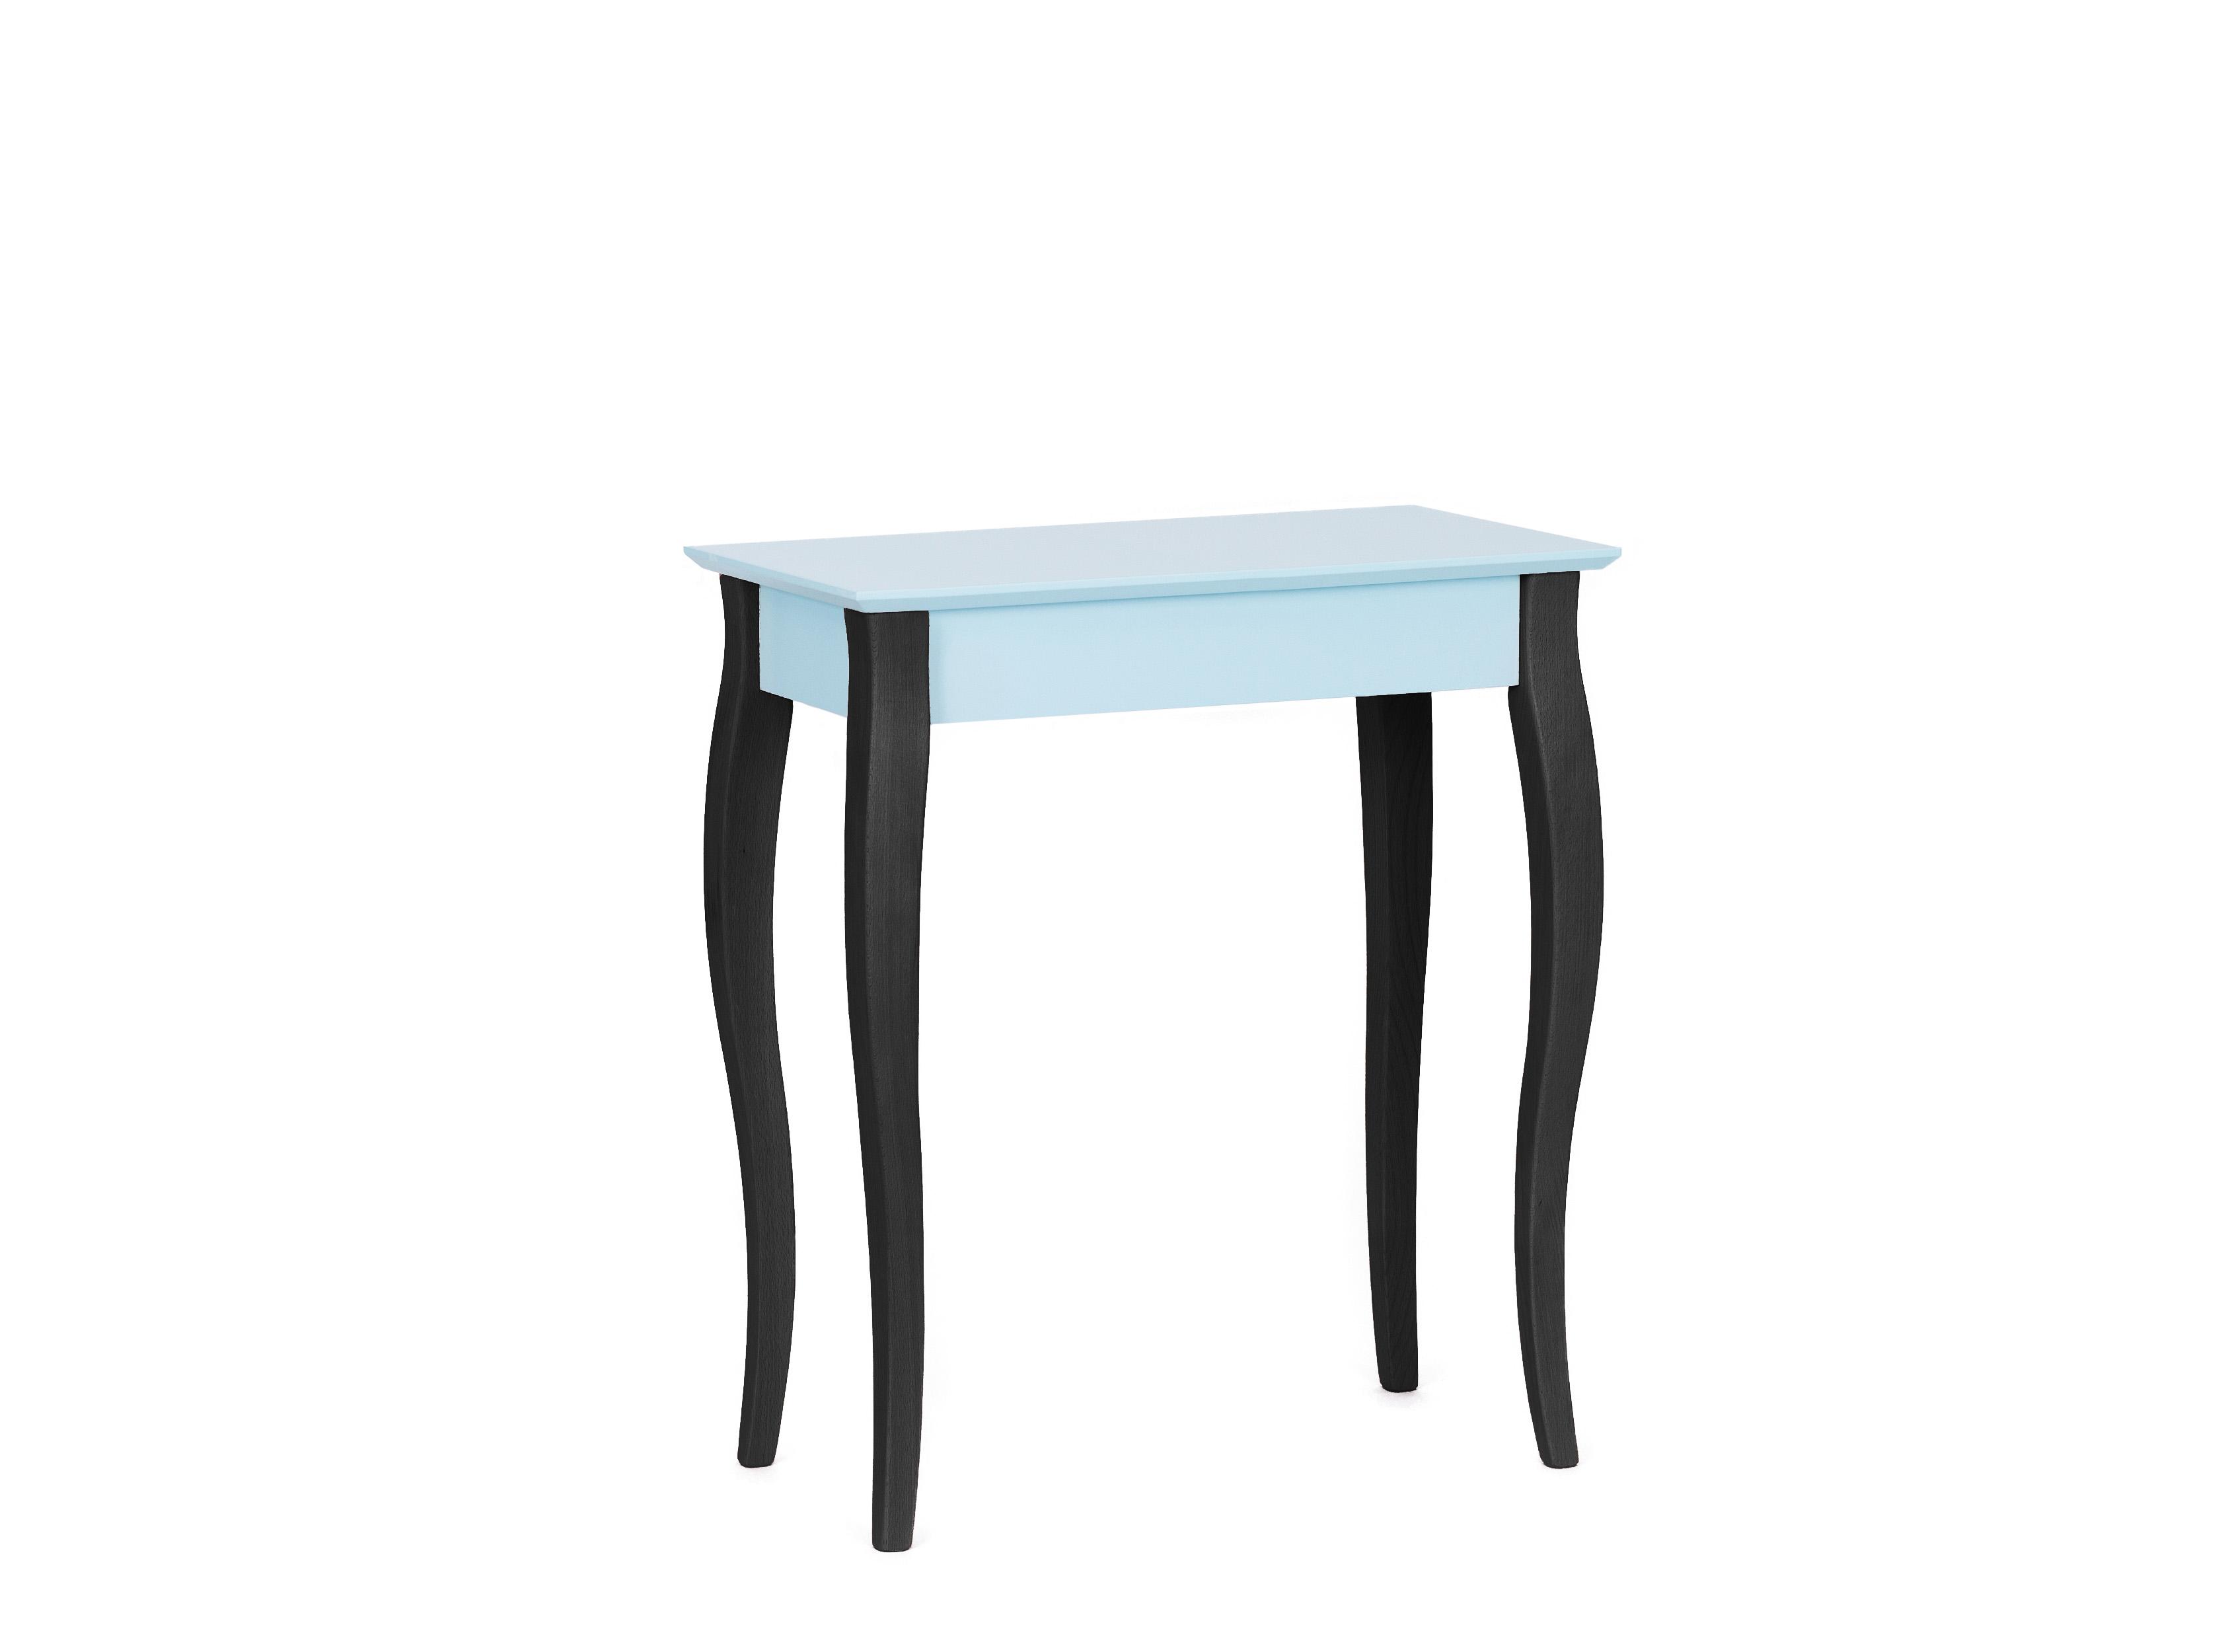 poze cu Consola Lillo Small Light Turquoise / Black, L65xl40xh74 cm